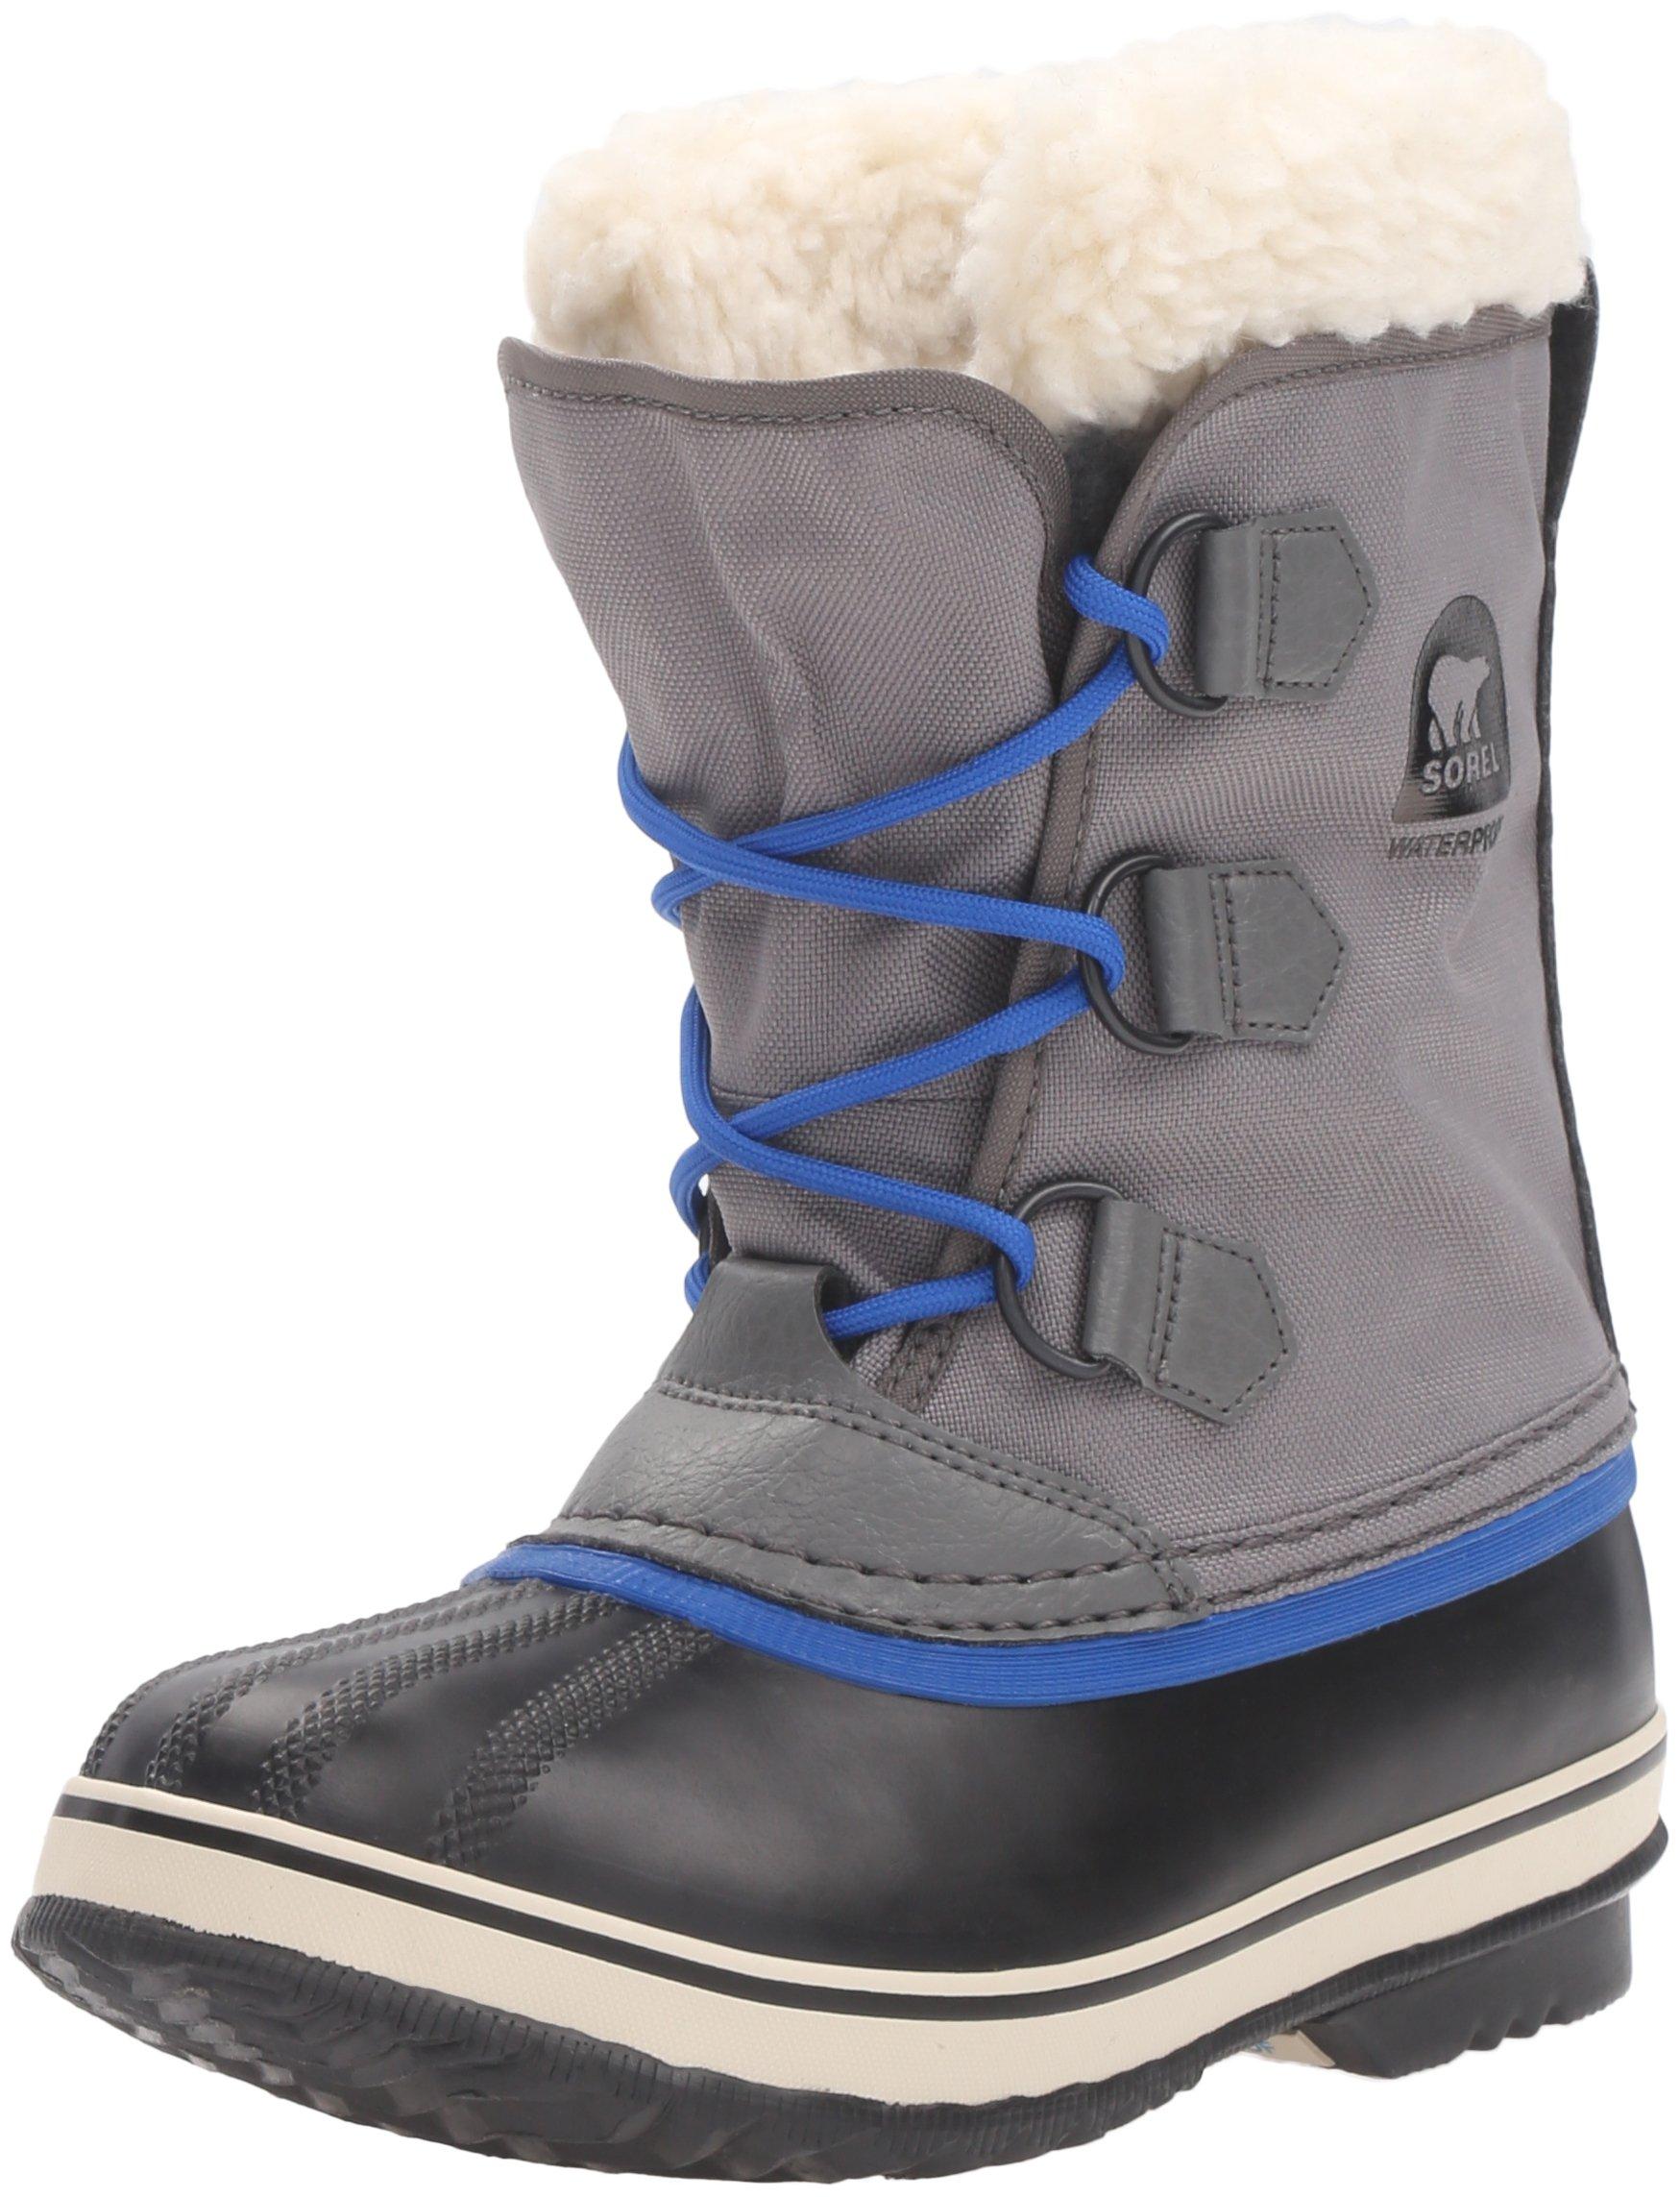 SOREL Yoot Pac Nylon-K Snow Boot, Grey, 3 M US Little Kid